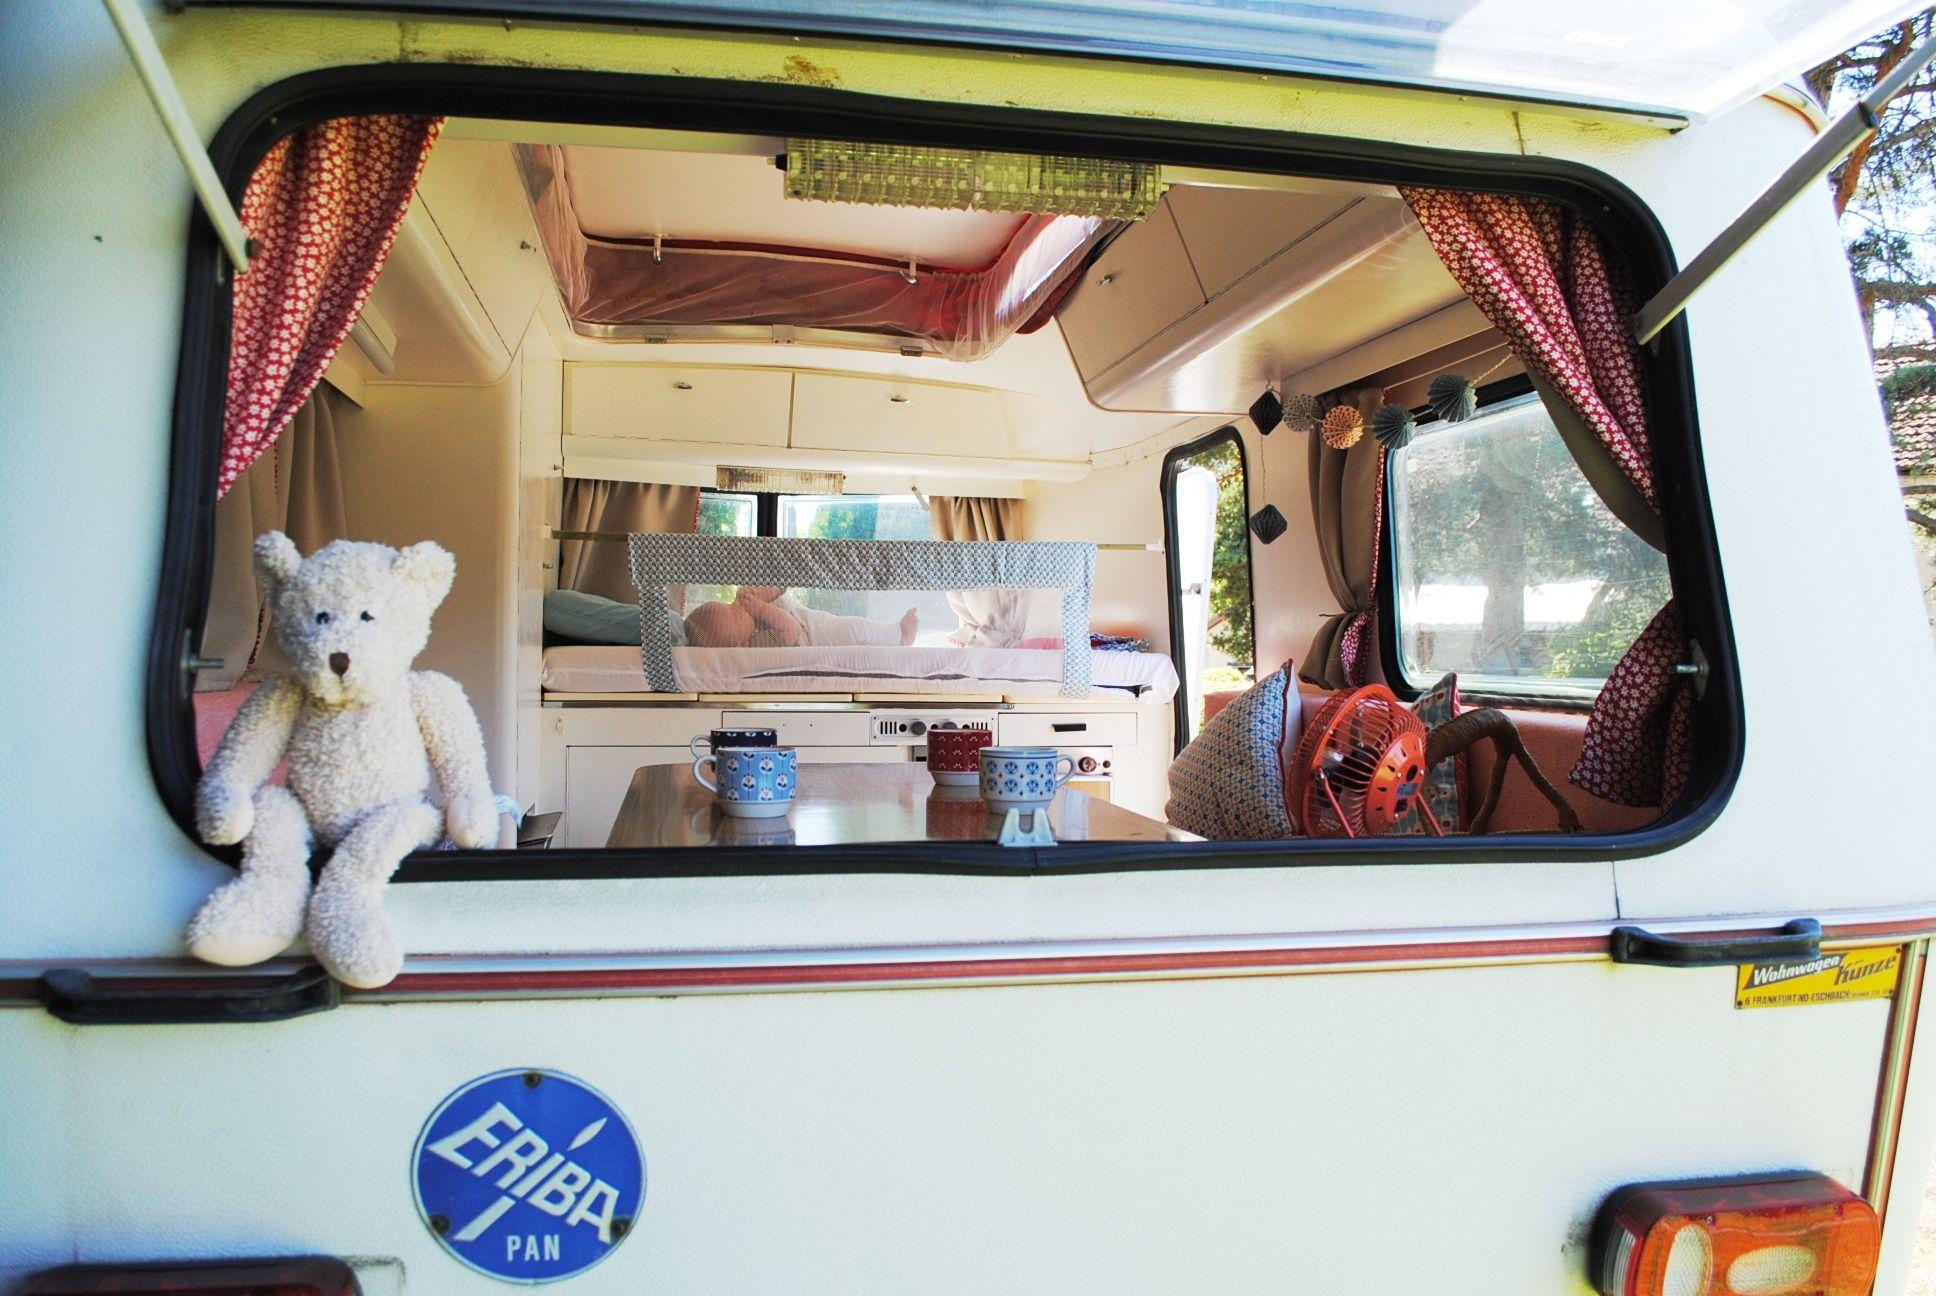 relooking caravane eriba pan 77 caravane vintage relook e pinterest relooking caravane. Black Bedroom Furniture Sets. Home Design Ideas